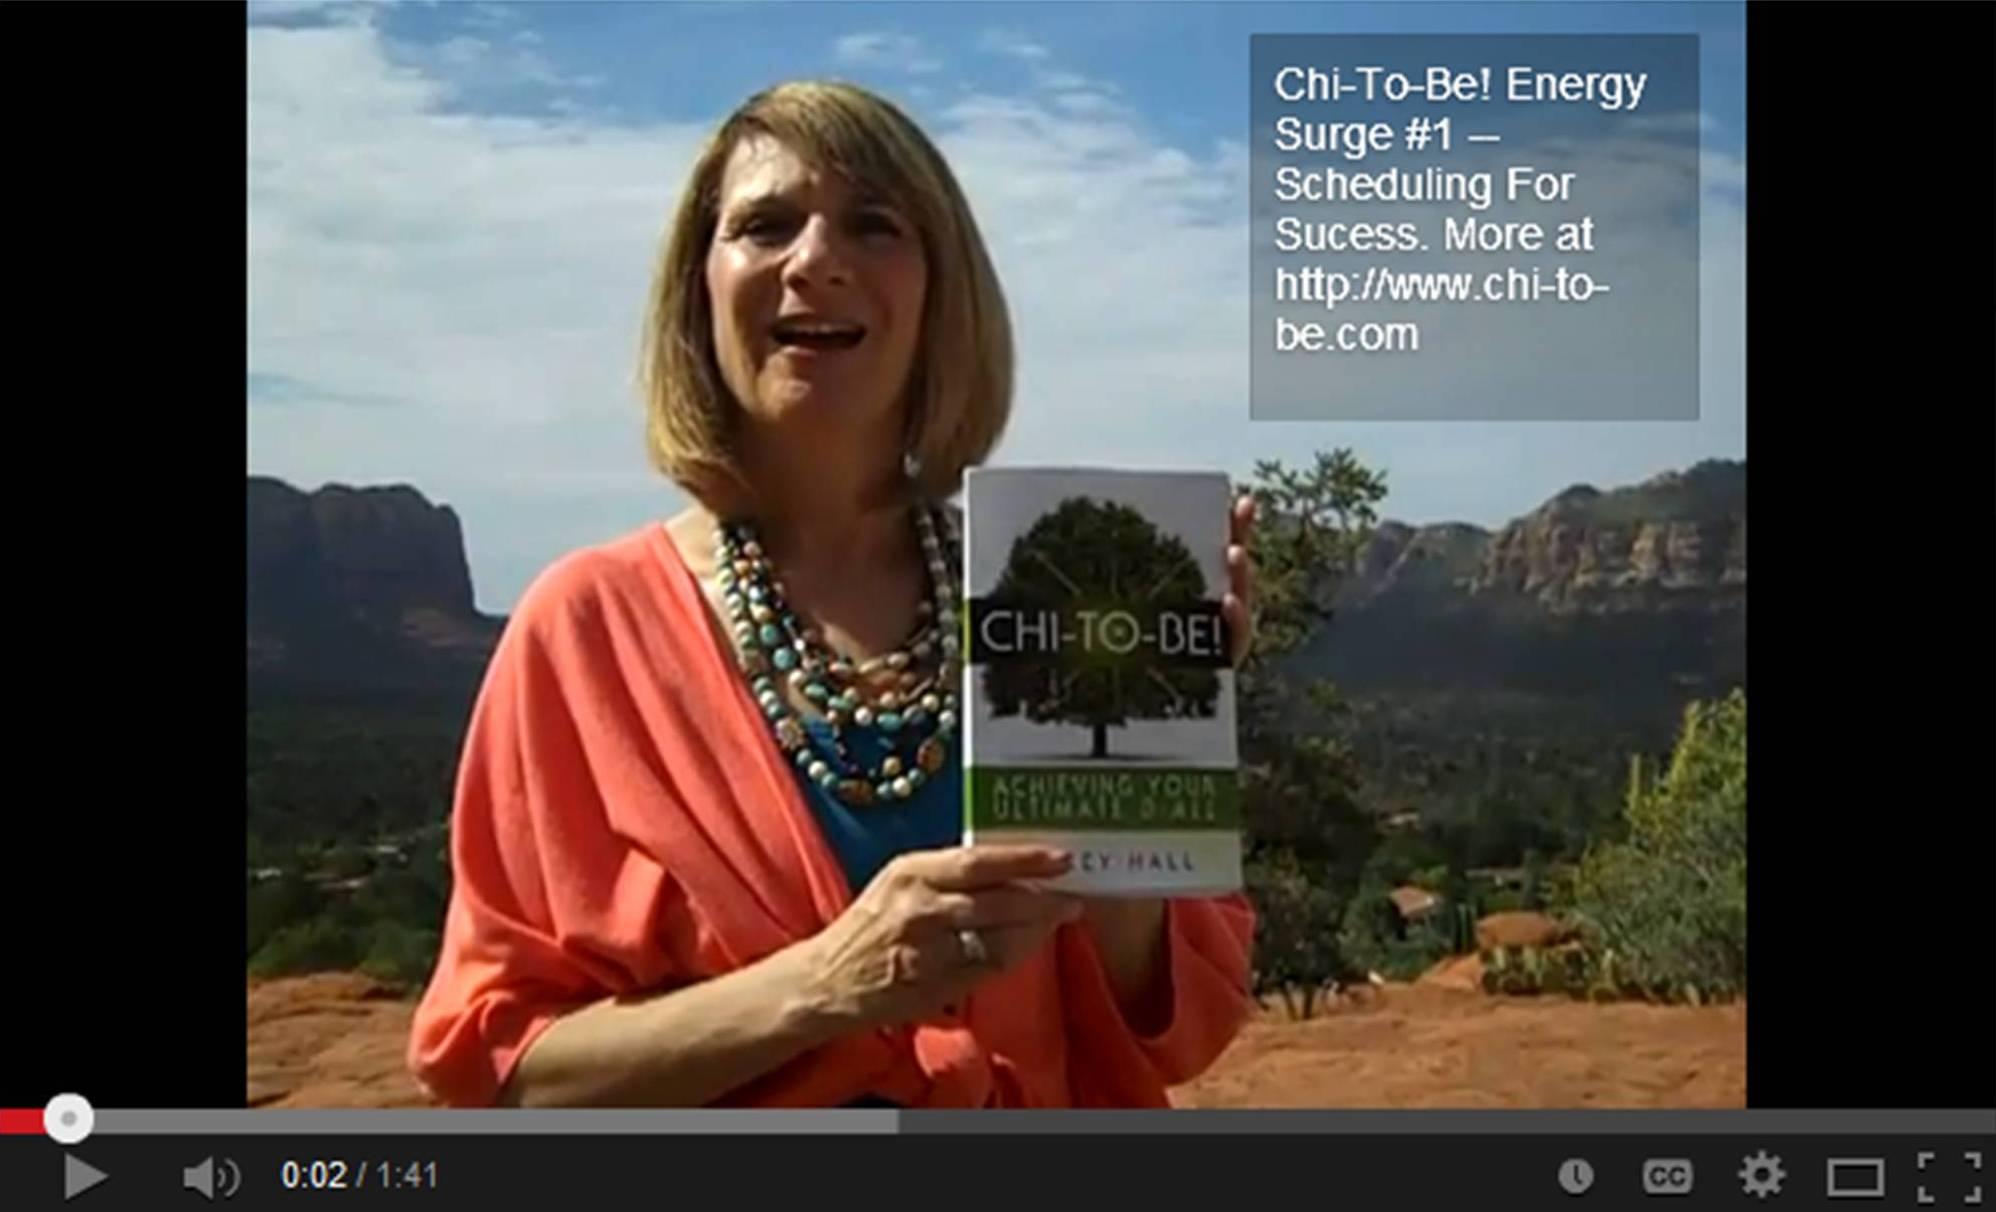 Energy Surge 1 - video